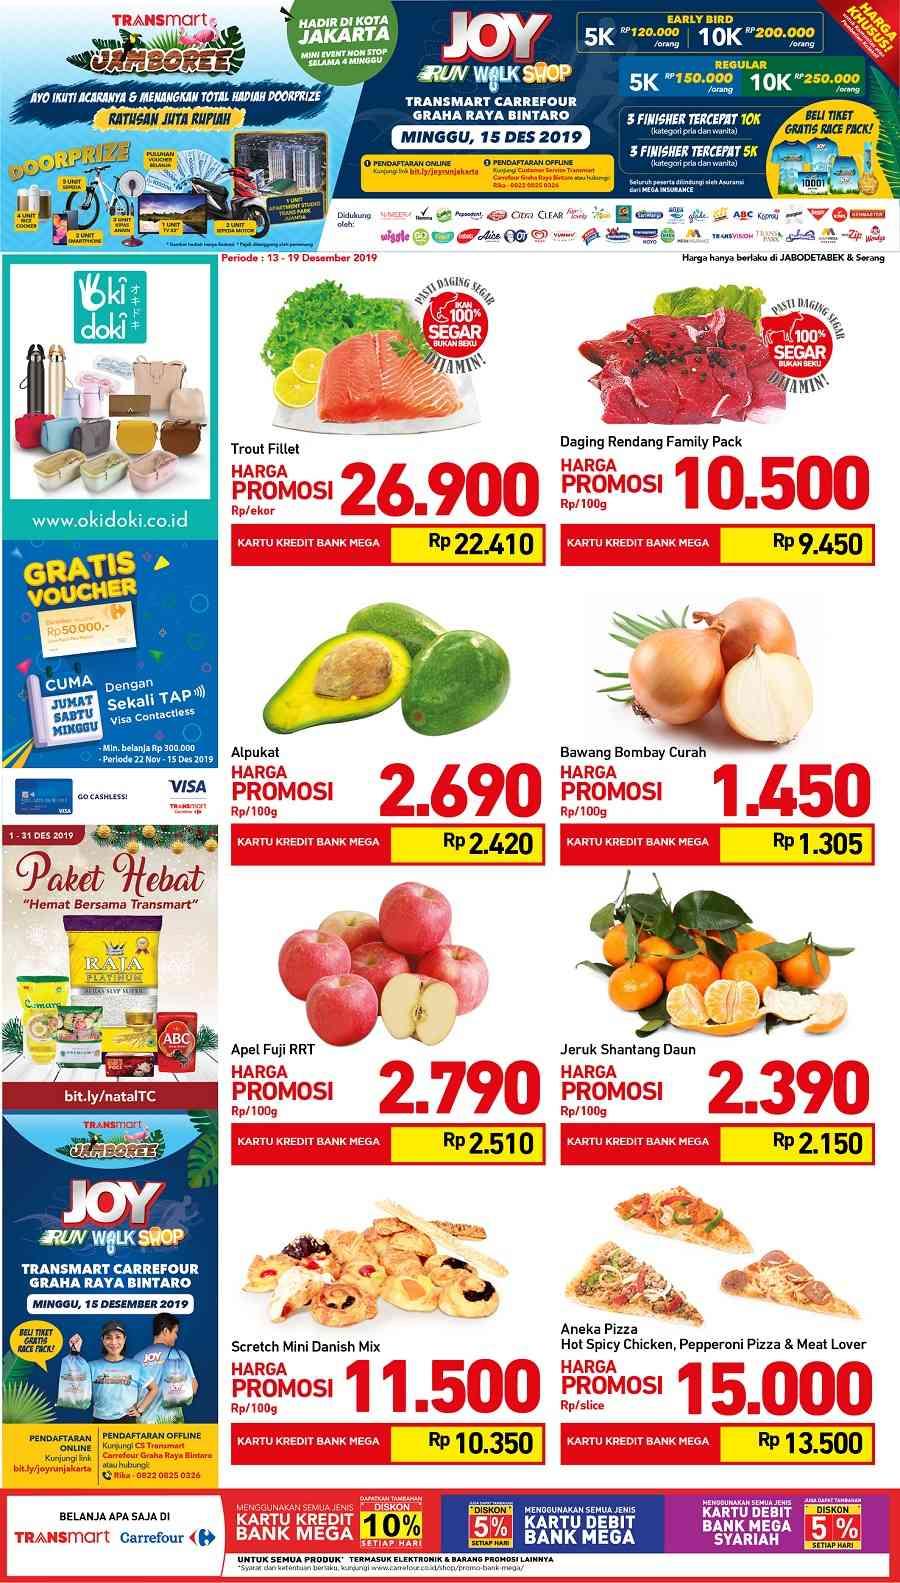 Promo Carrefour Katalog Promo Hebat Sepekan Fresh Periode 13-19 Desember 2019